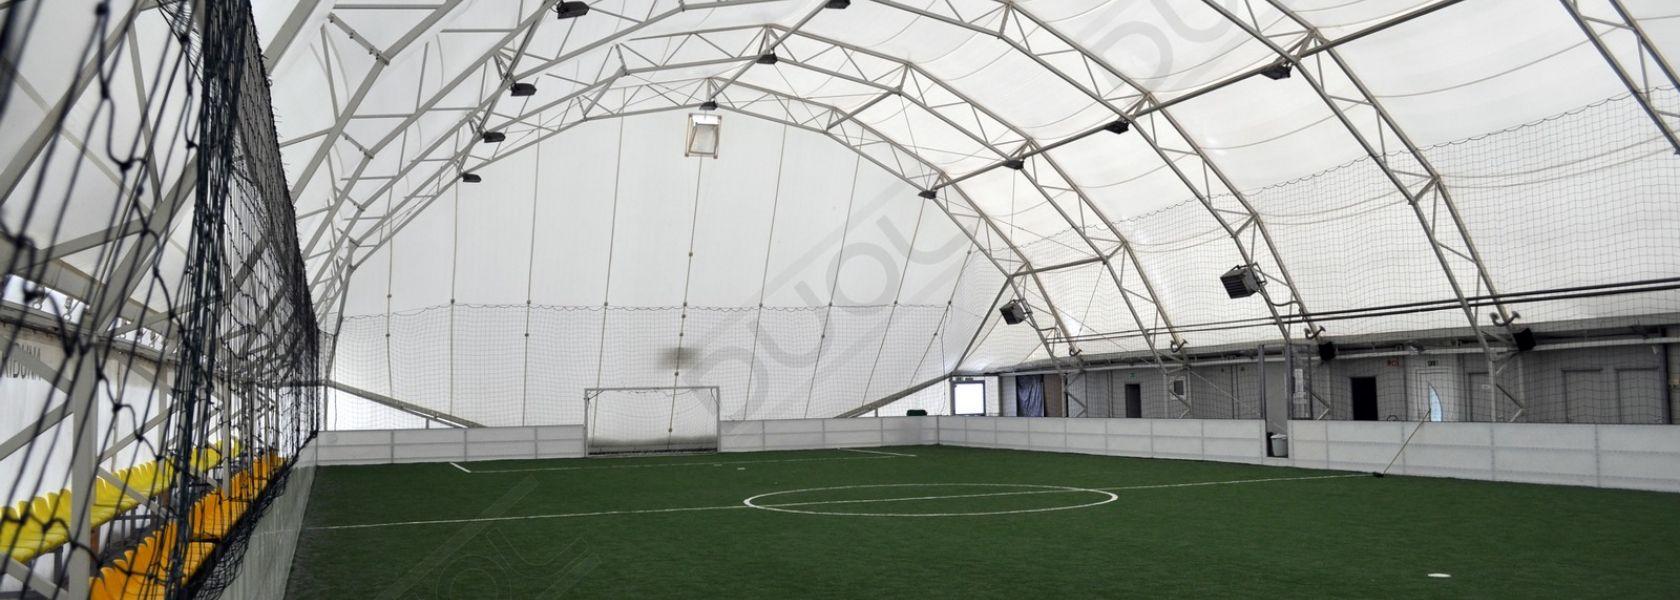 Športni center Marinko Galič